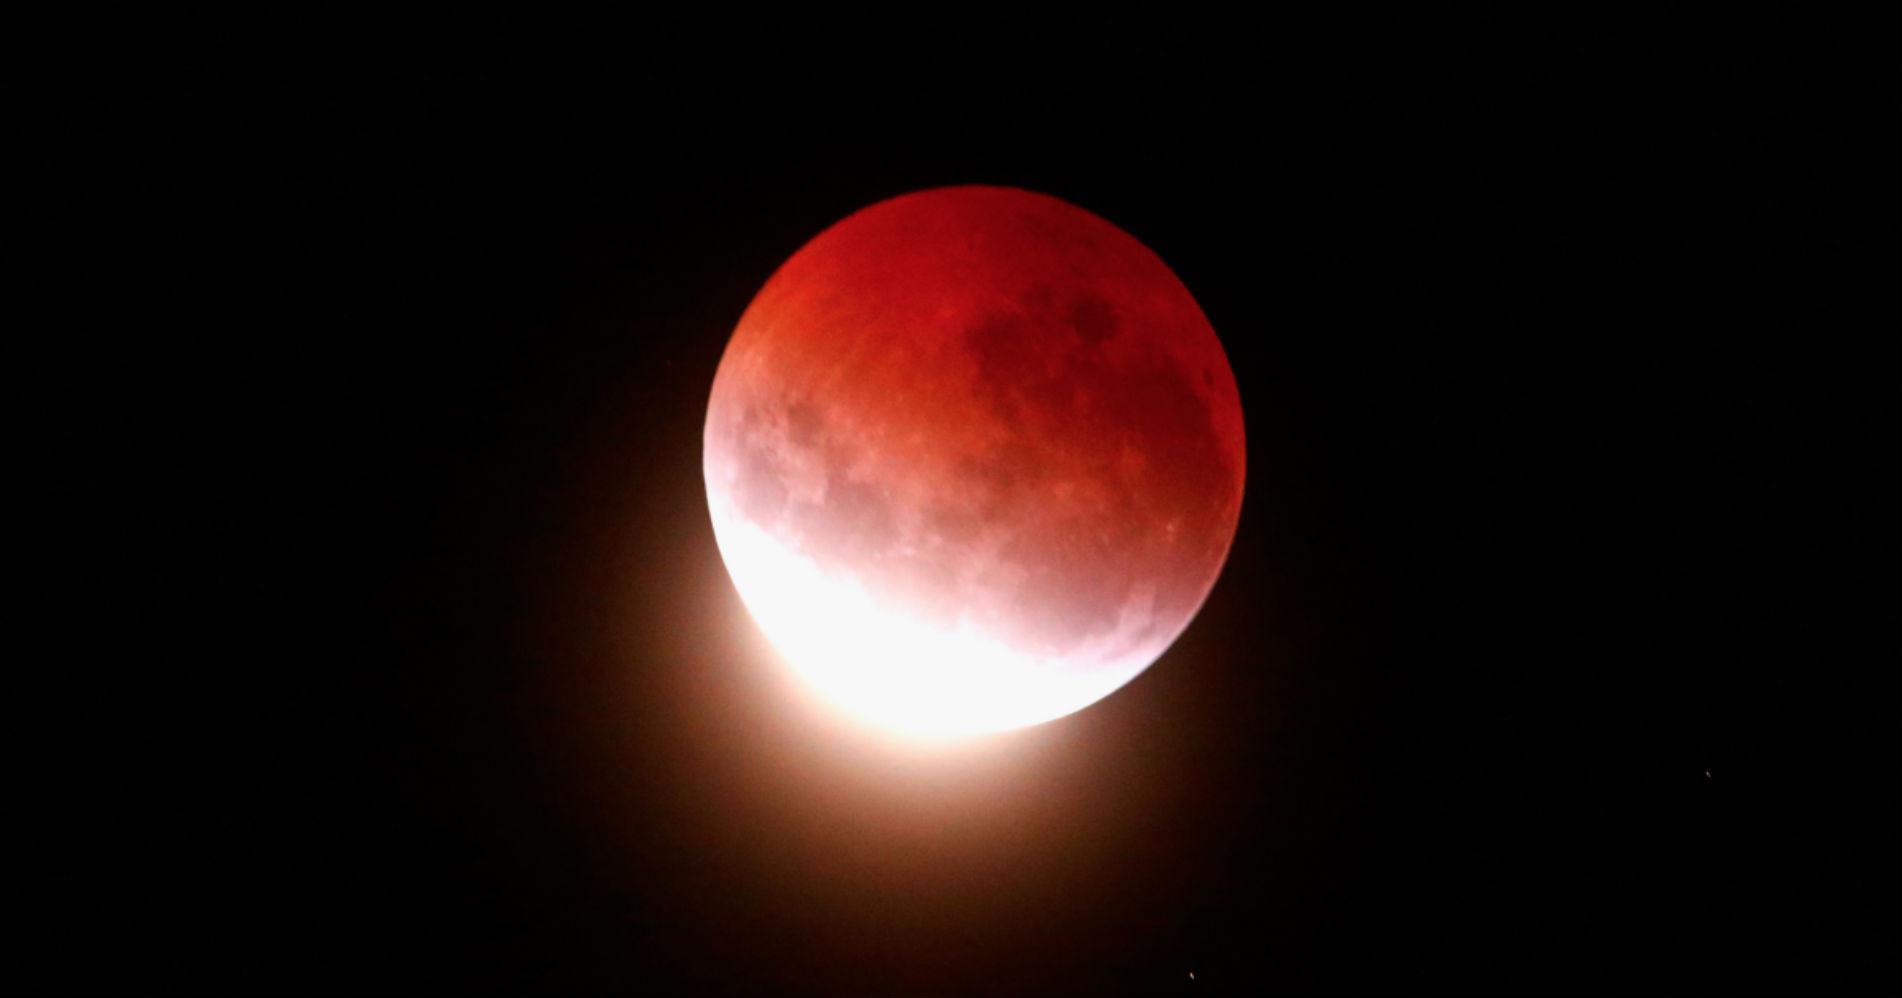 lunar-eclipse-affects-mood-1532652025865-1532652027922.jpg